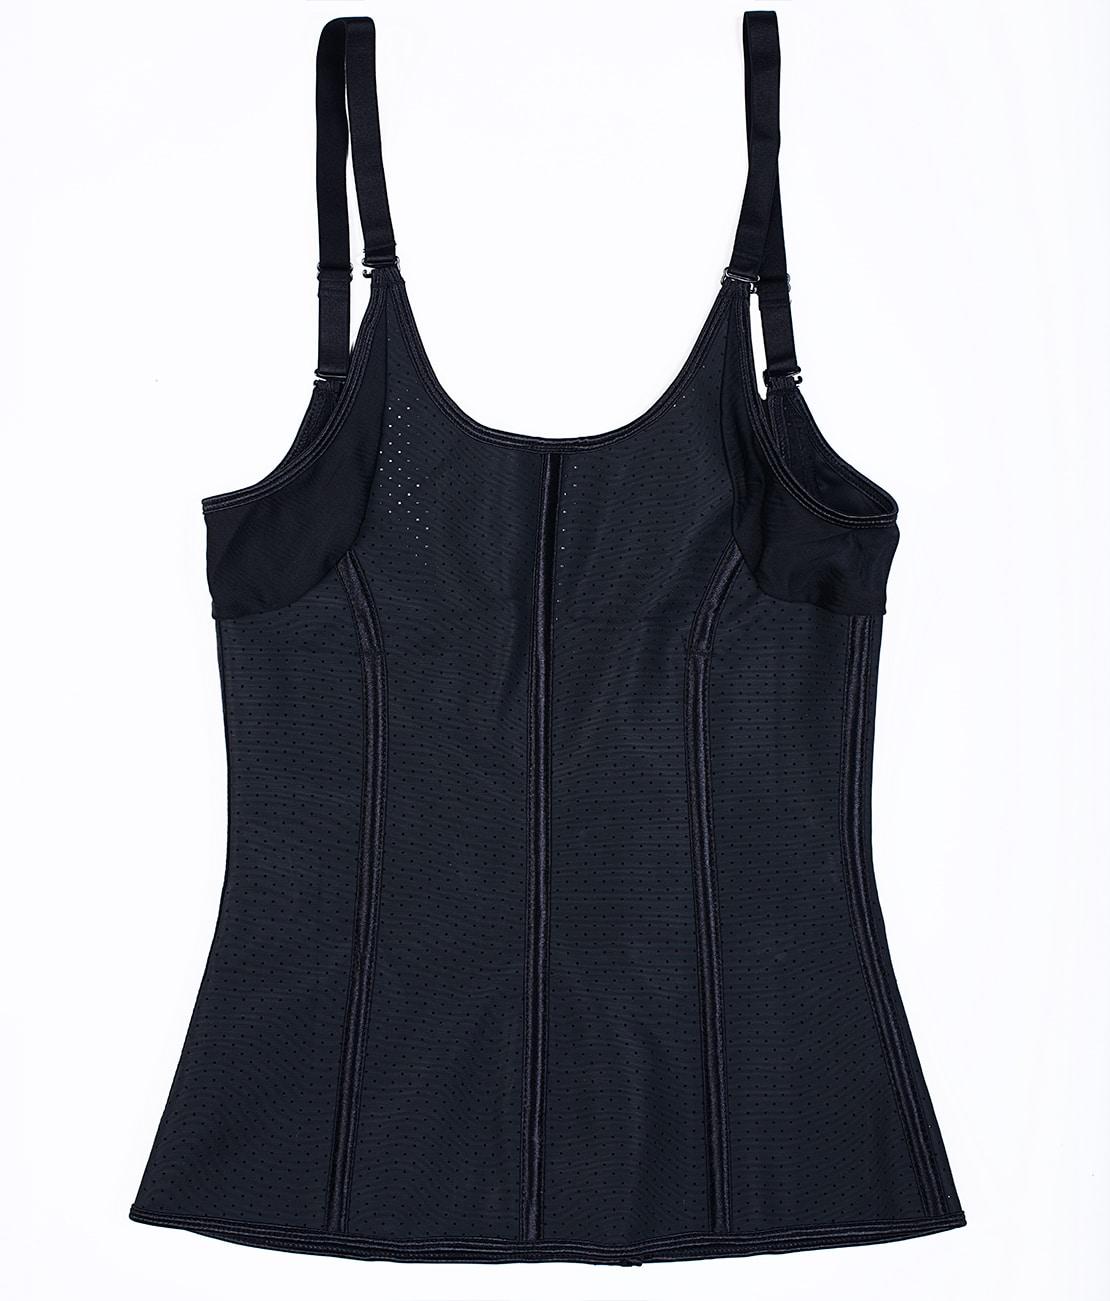 Corset Latex Grand Confort Noir Packshot Back